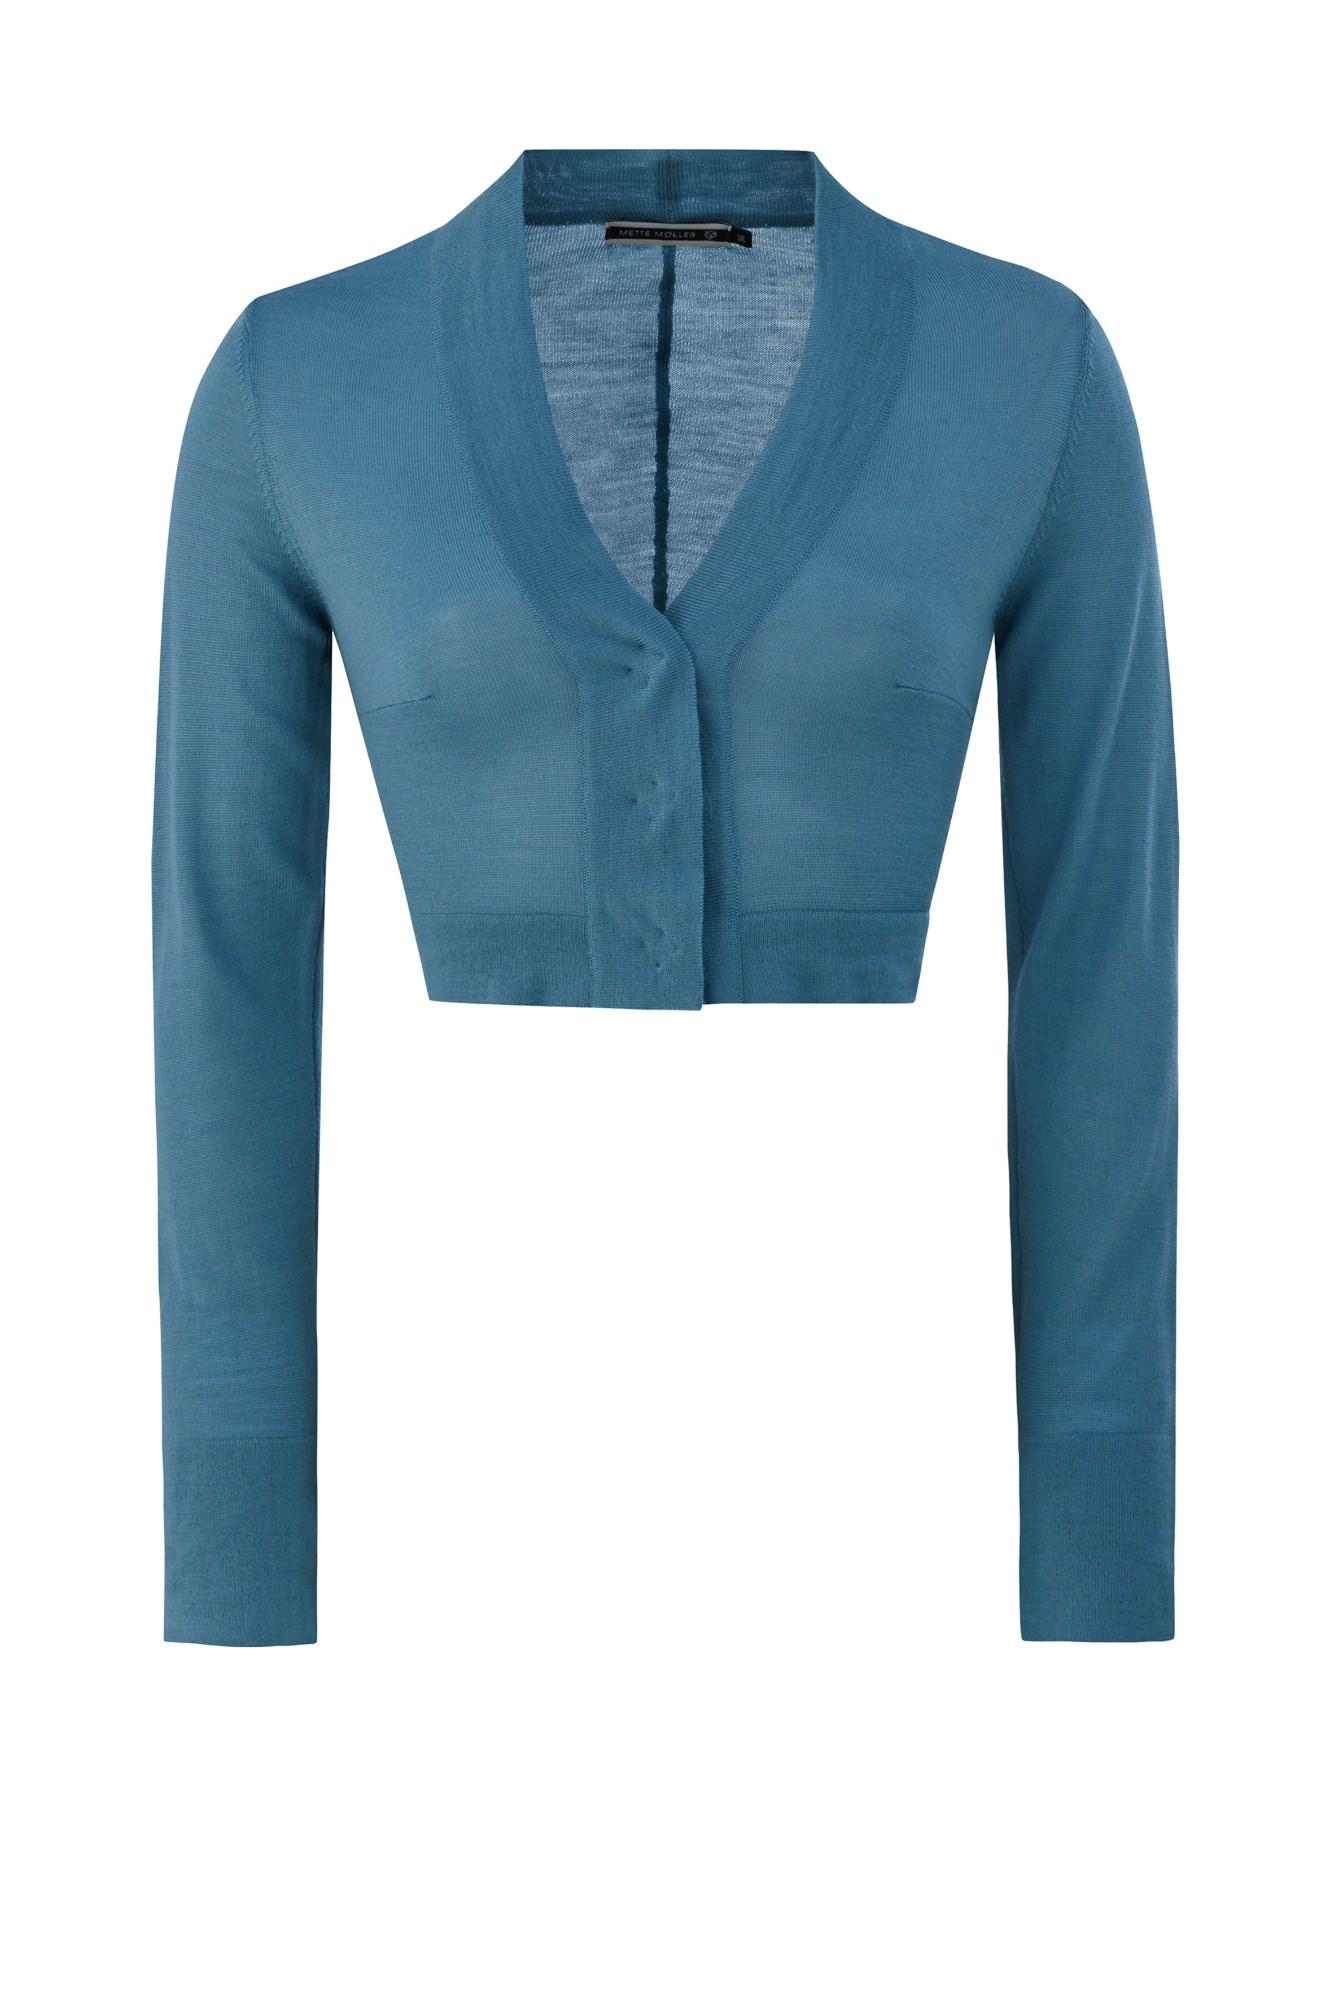 4966ddcf Summer magnolia bolero - Short - Long sleeves - Jacket/Cardi..